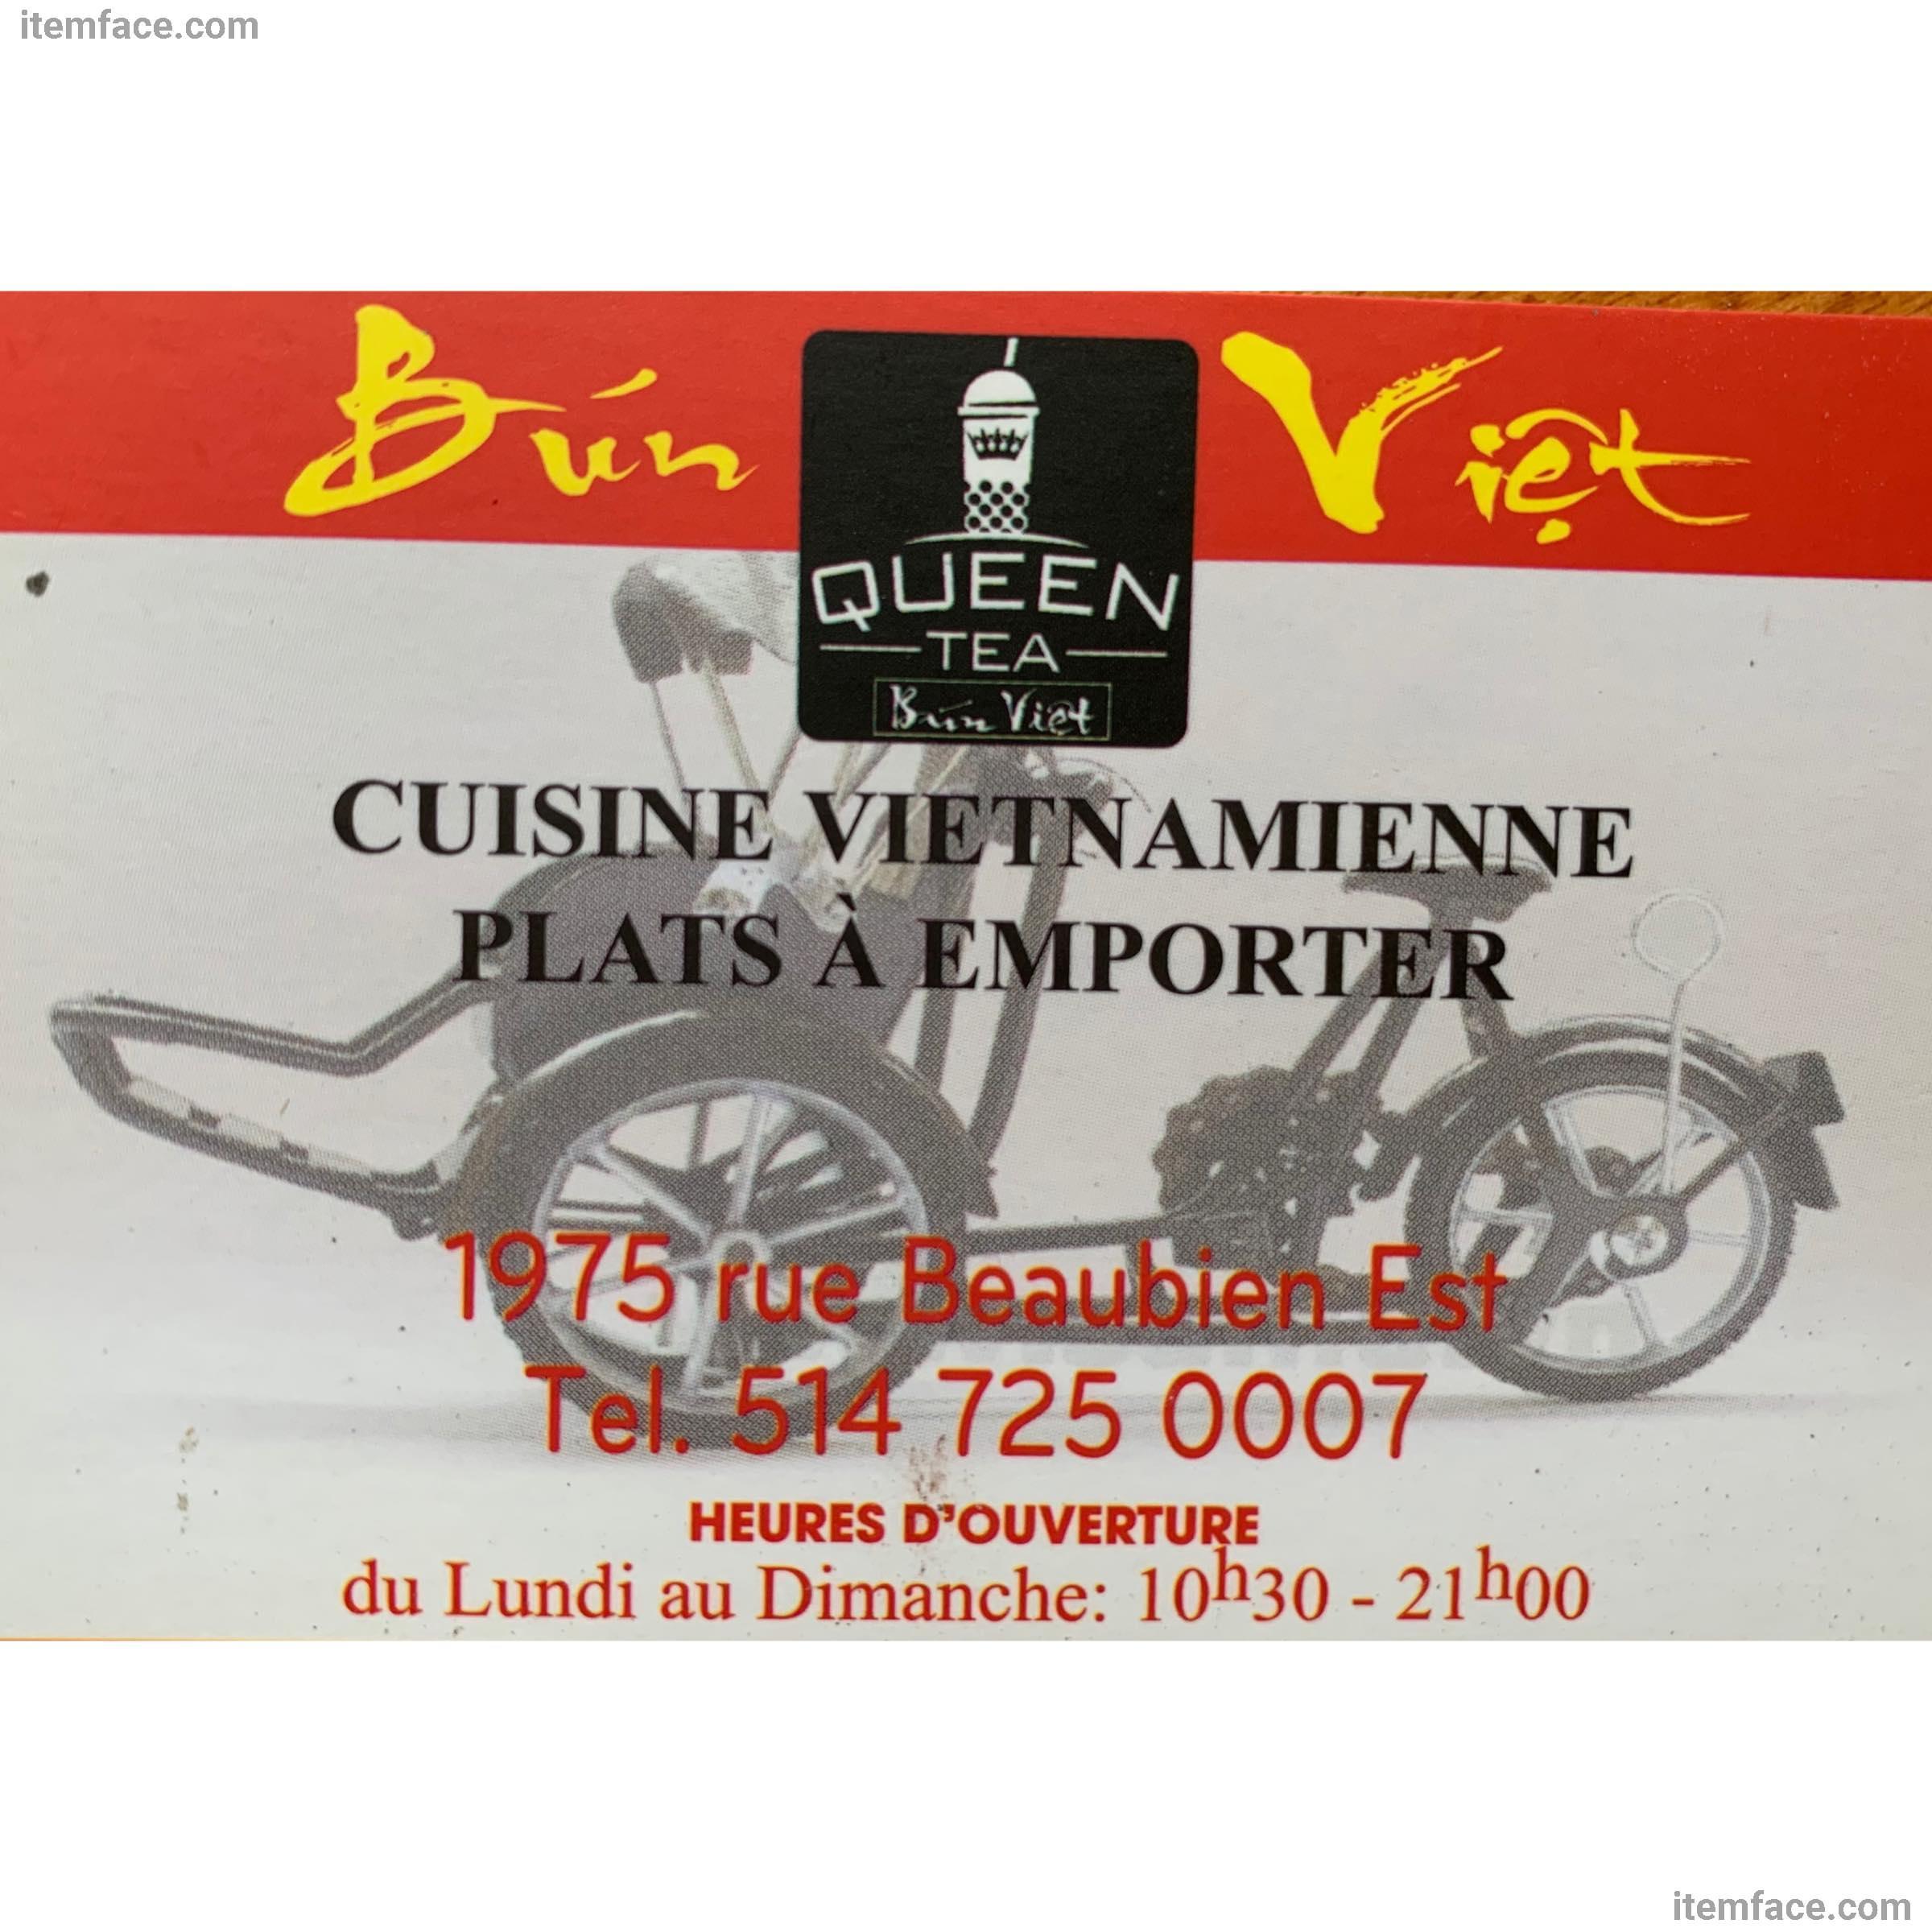 Bun Viet 2 (Beaubien) - Restaurant